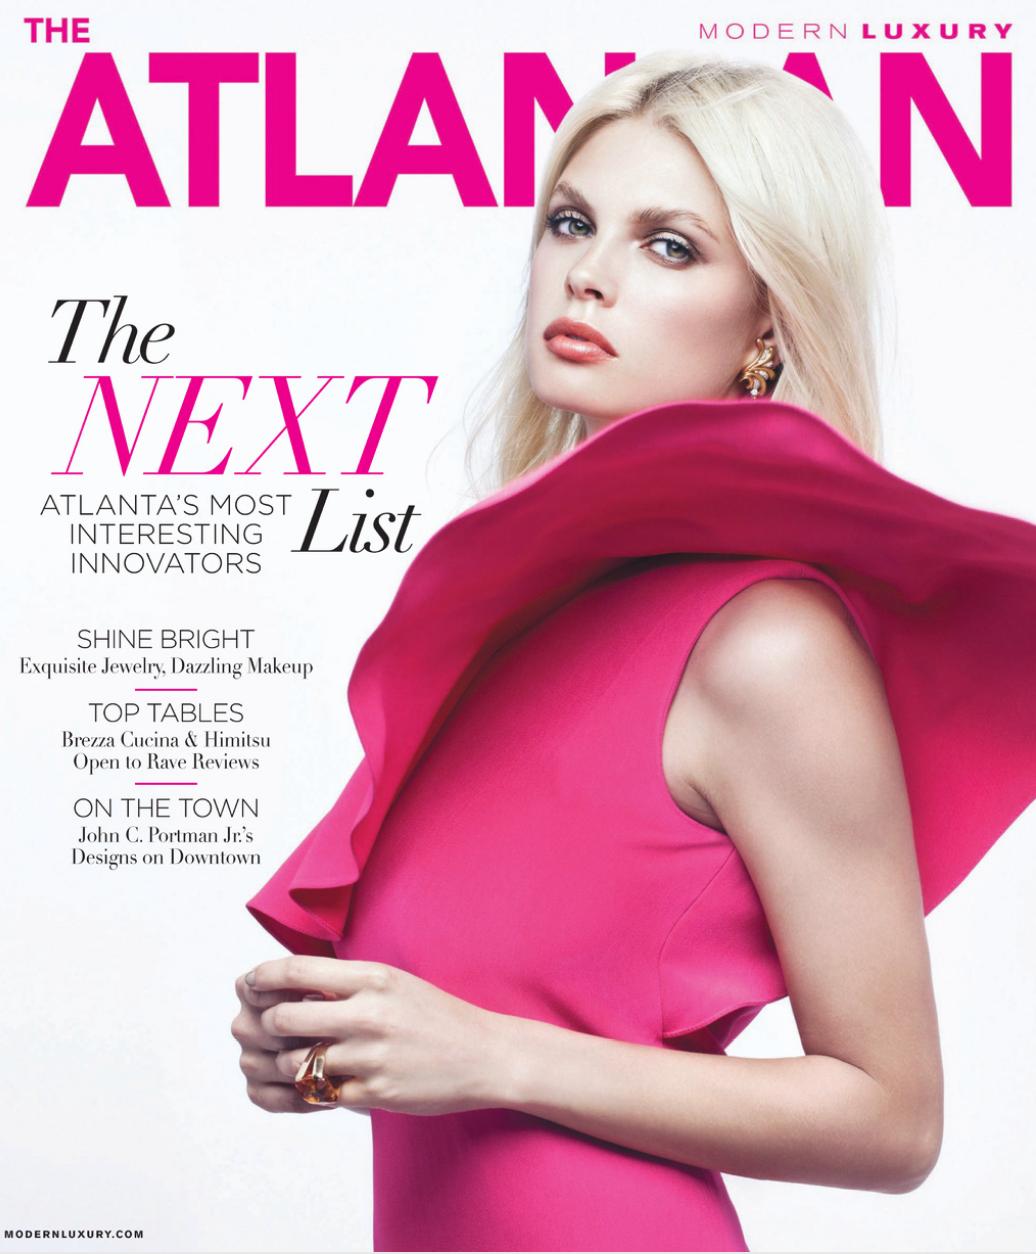 The Atlantan Magazine | December 11, 2015